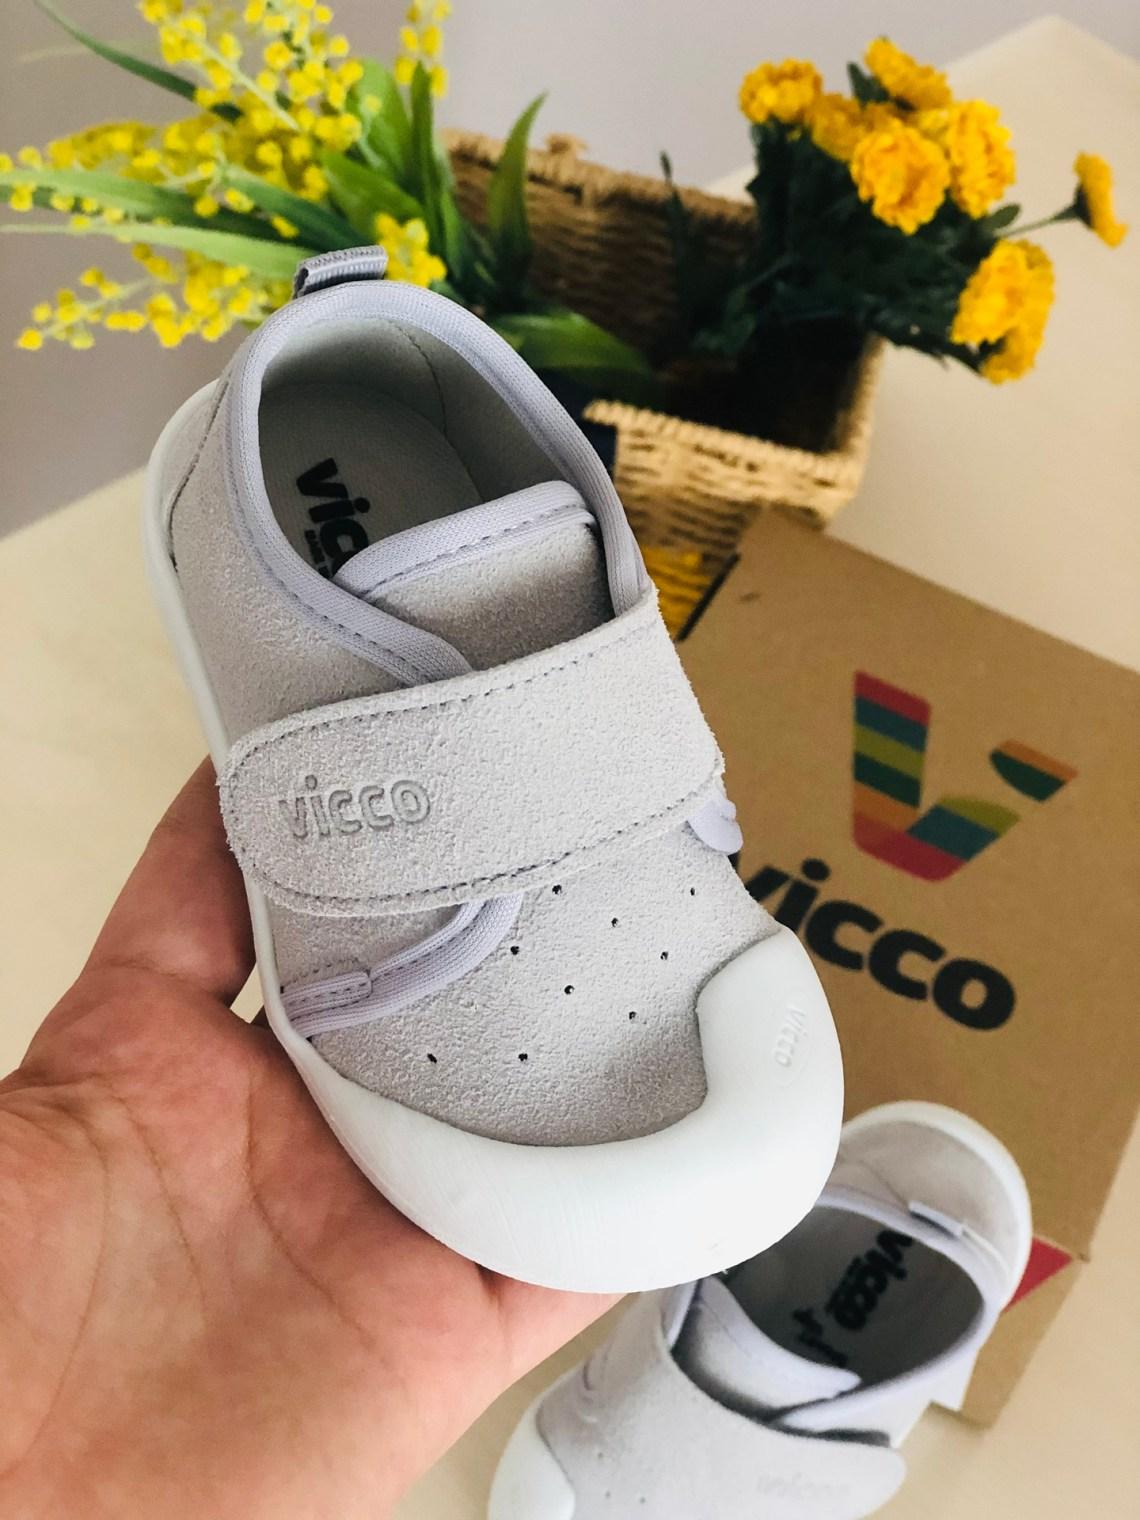 vicco-anka-ilk-adim-ayakkabisi